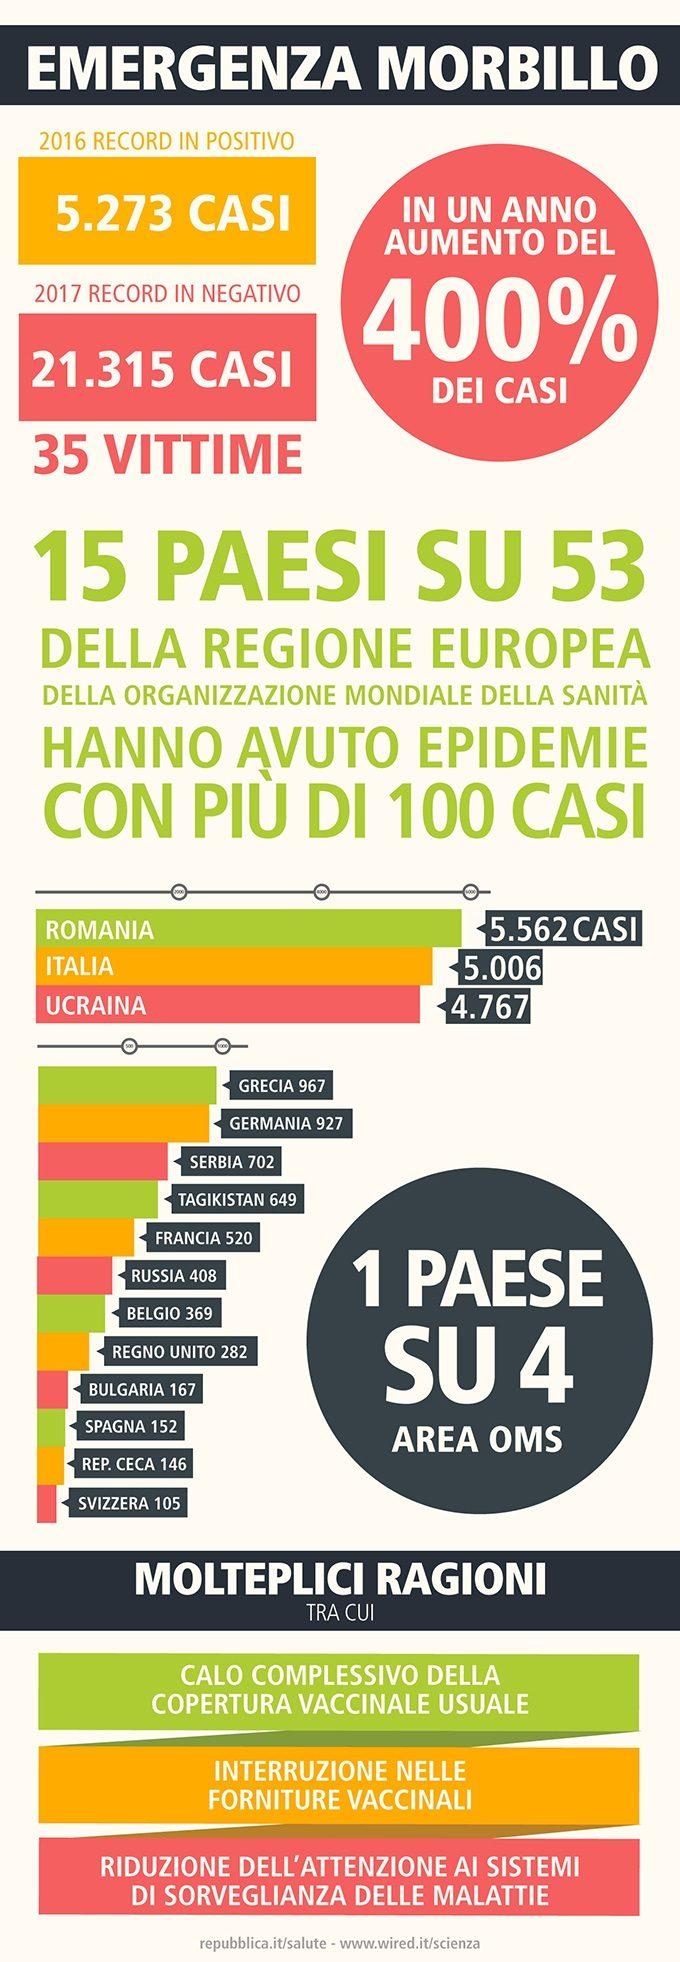 Emergenza Morbillo - Epidemie Morbillo Europa - INFOGRAFICA - Stampaprint